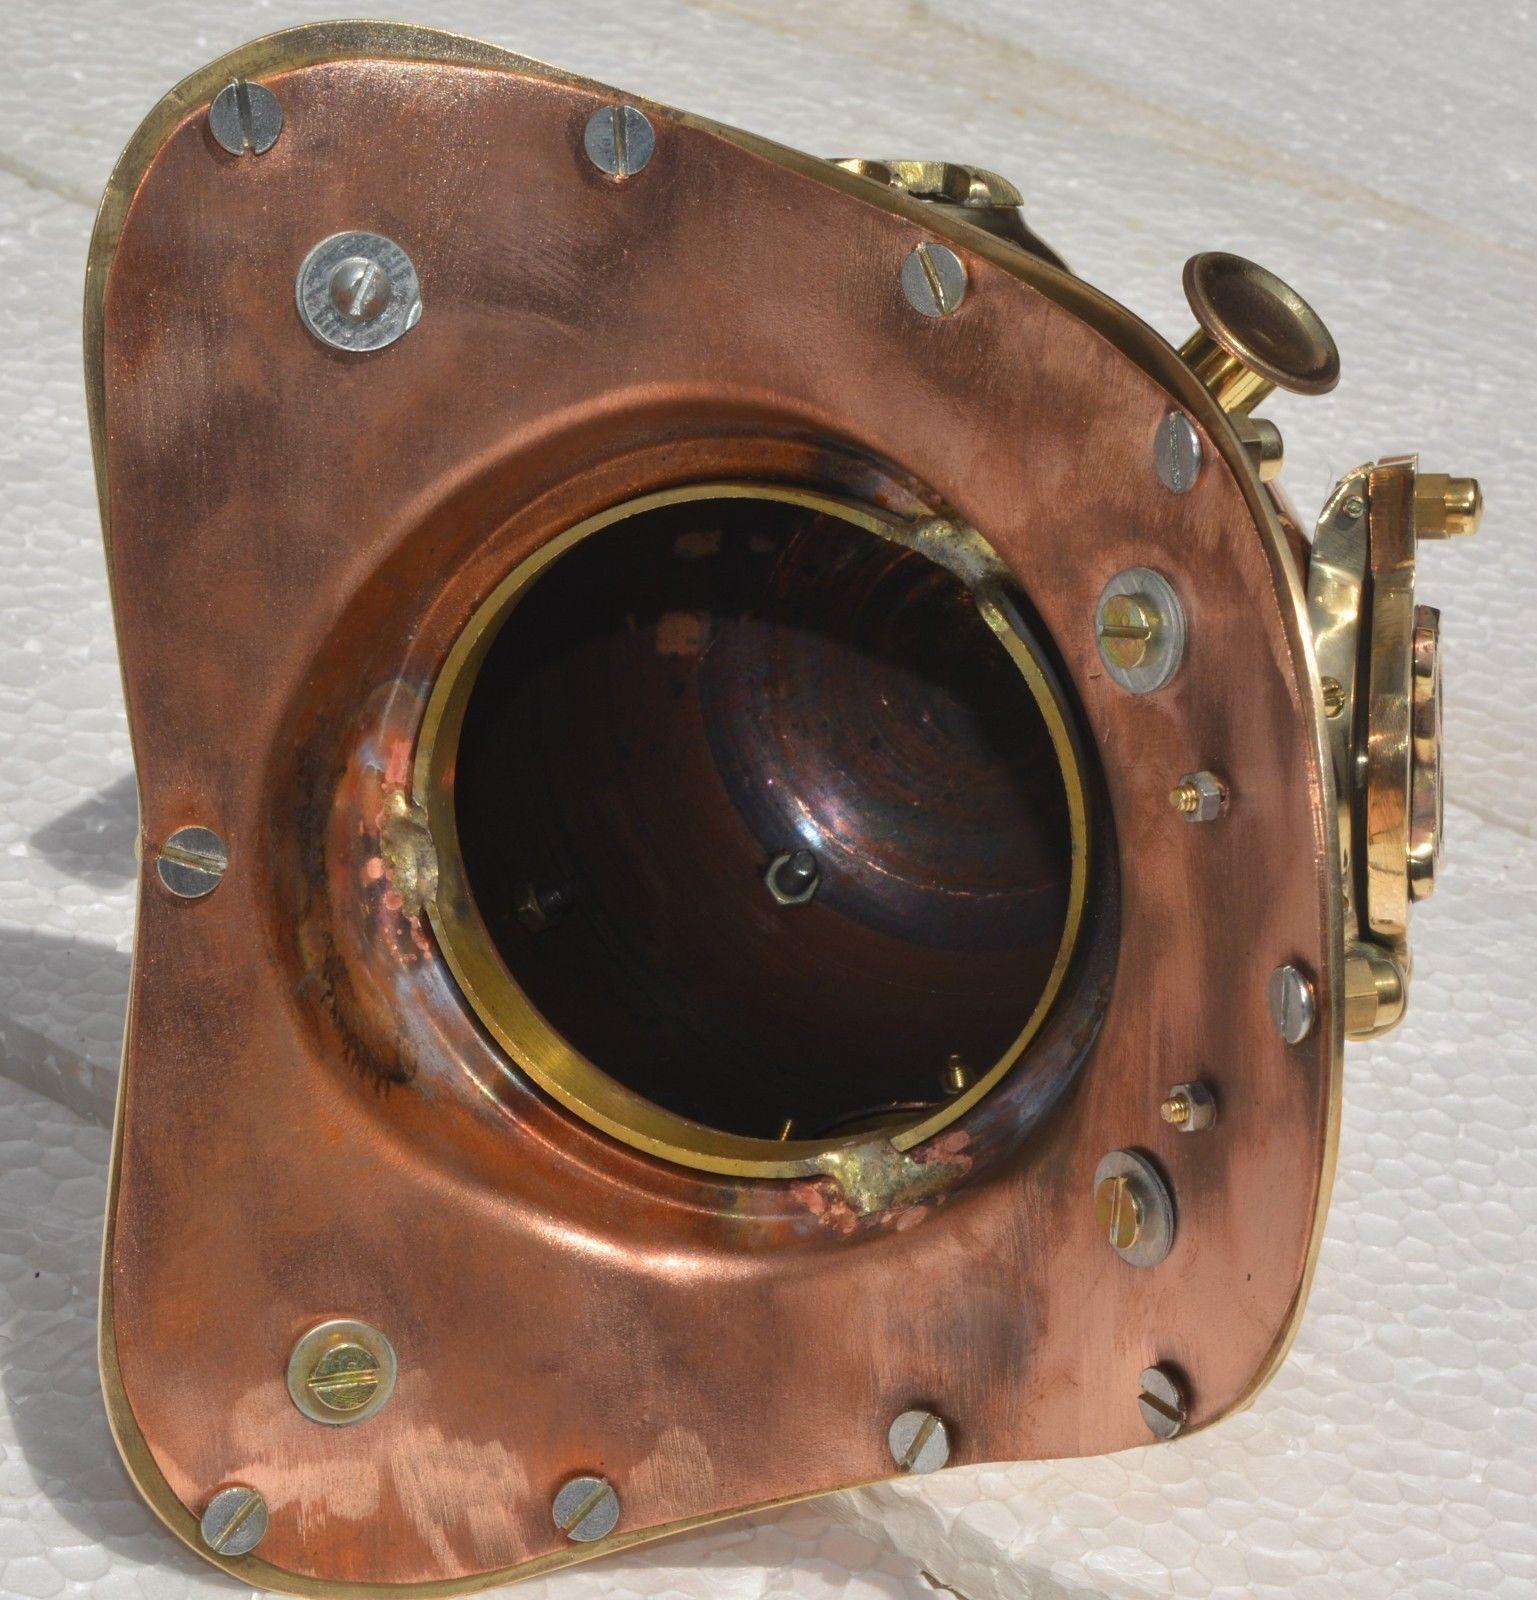 "US Navy Mark V Copper Finish Antique Diving Divers Helmet Scuba Copper & Brass"""